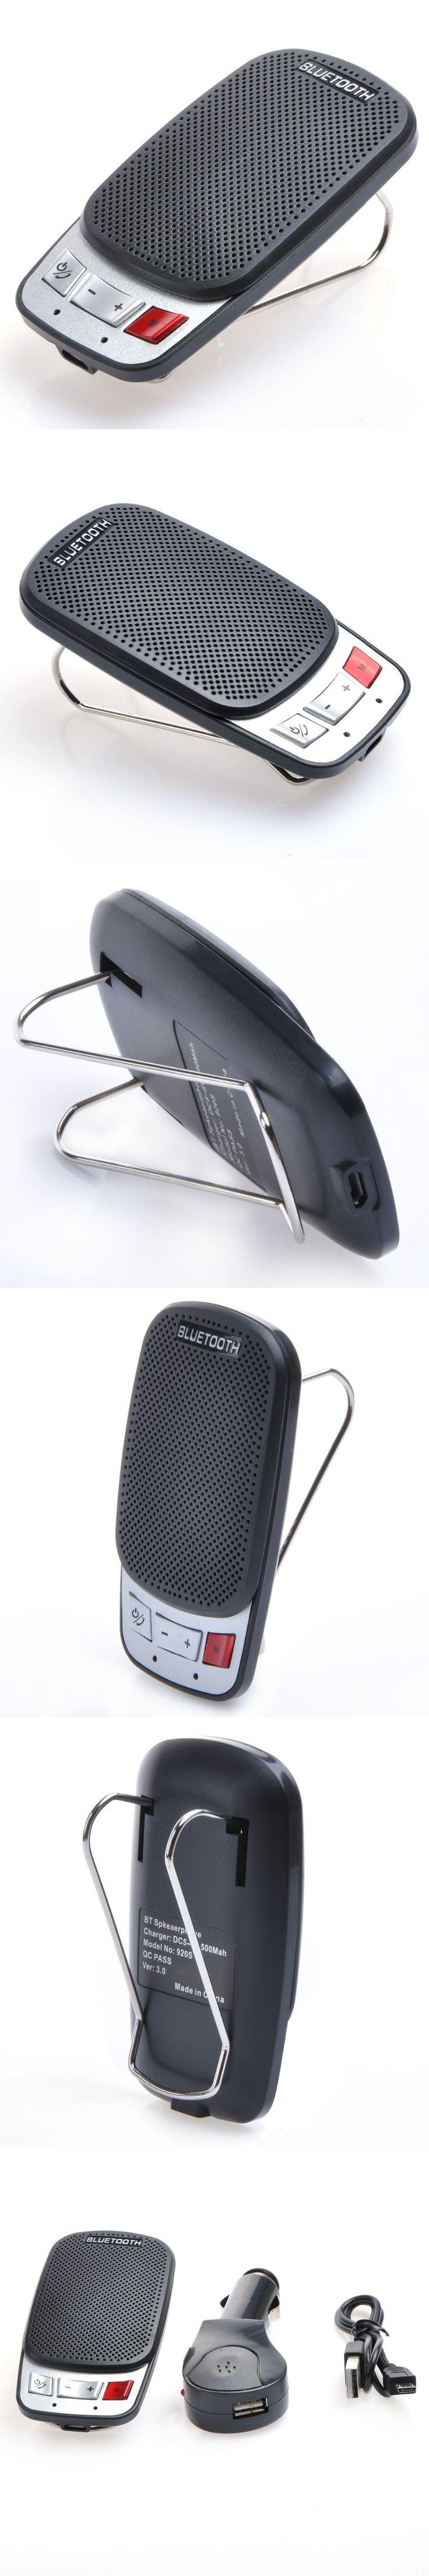 2016 Wireless Car Bluetooth Speakerphone Hands Free Car Kit Speakerphone For iPhone Smartphones Manos Libres Bluetooth Car 920BK